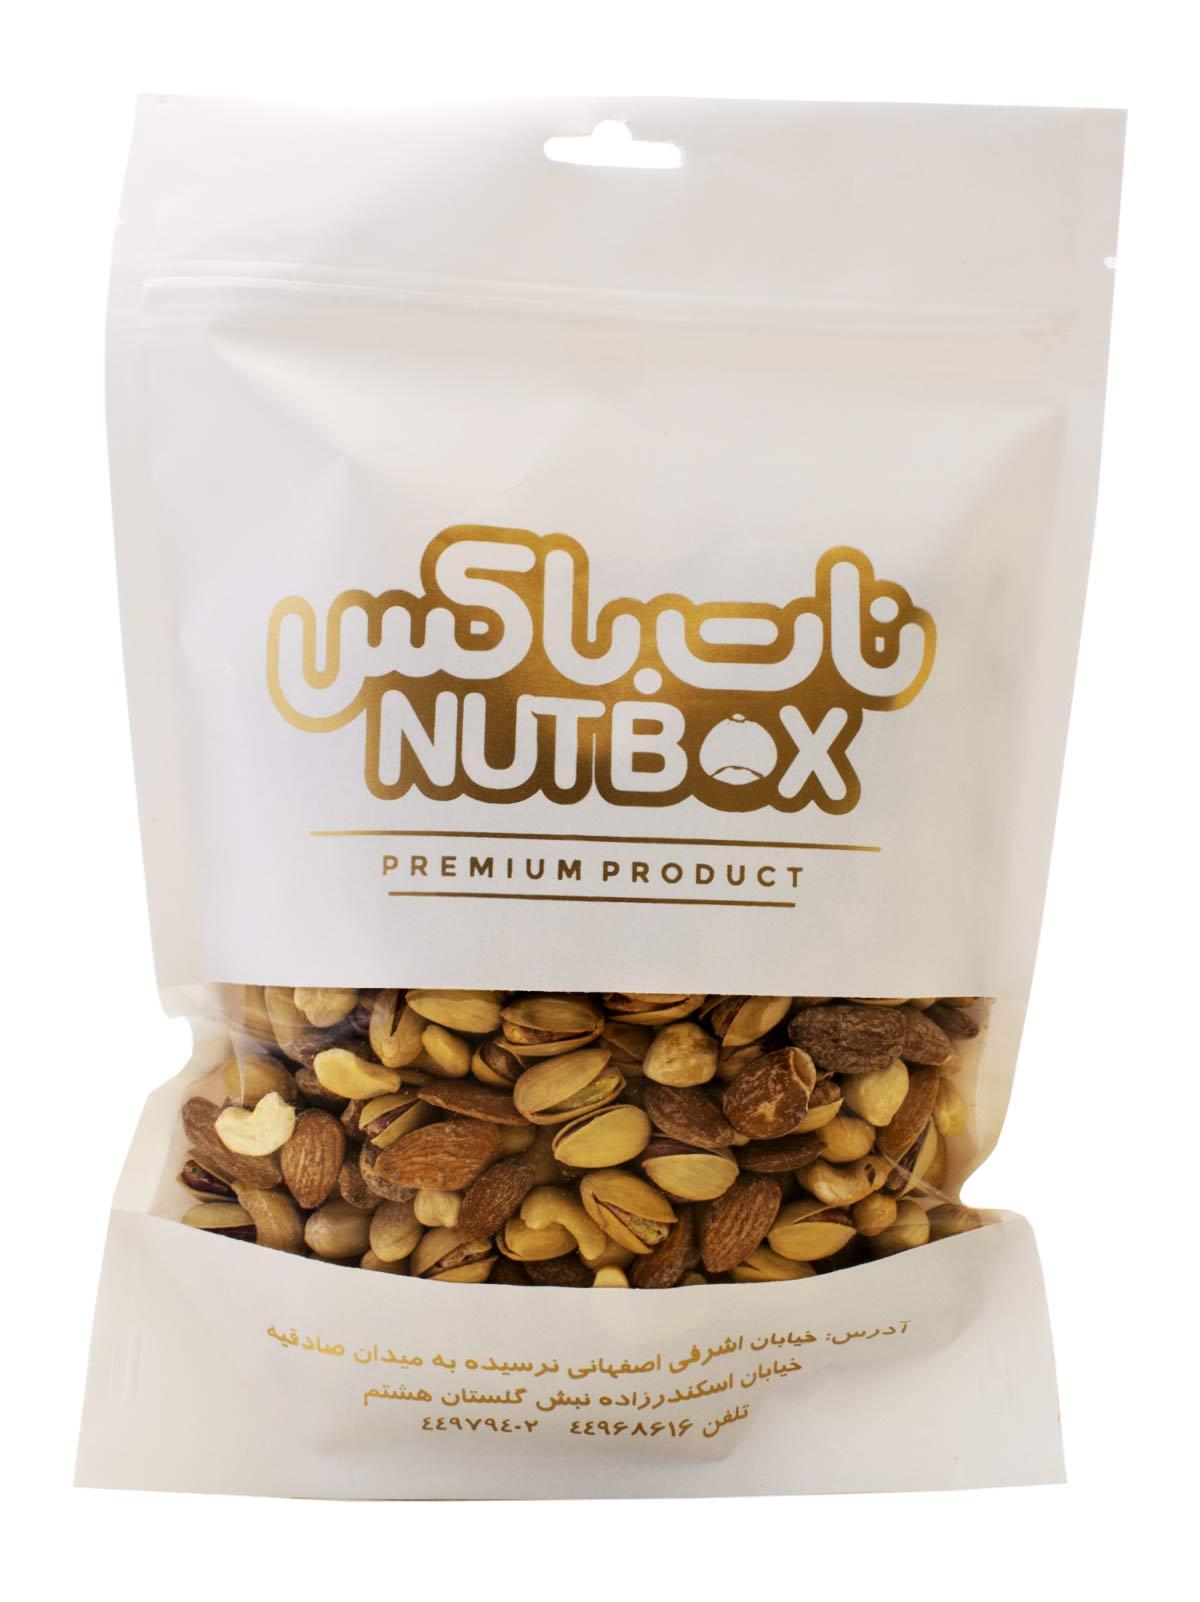 آجیل مخلوط نات باکس عربی (نمک دریایی) 250 گرم